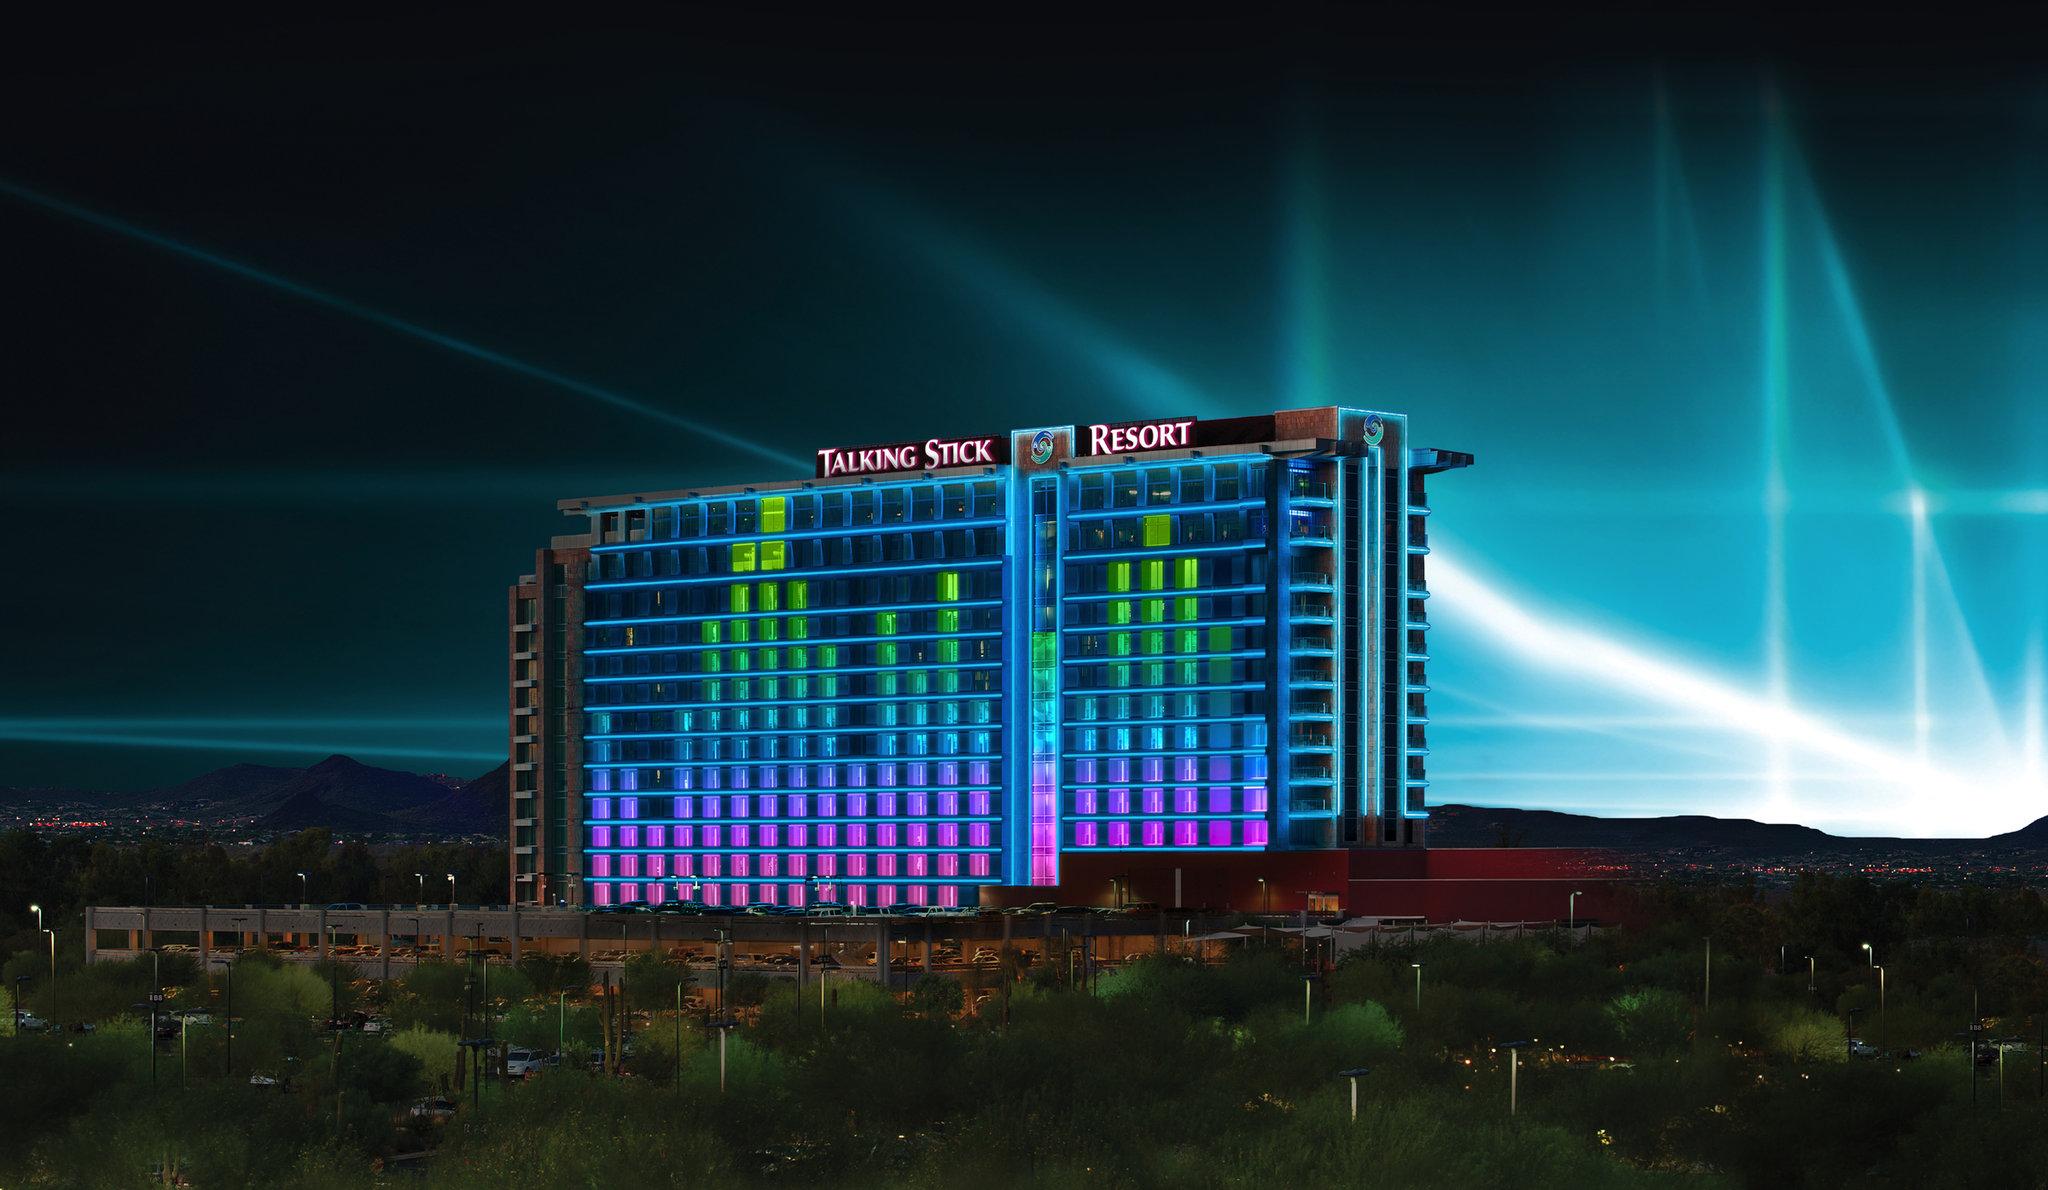 Spa Casino Parking